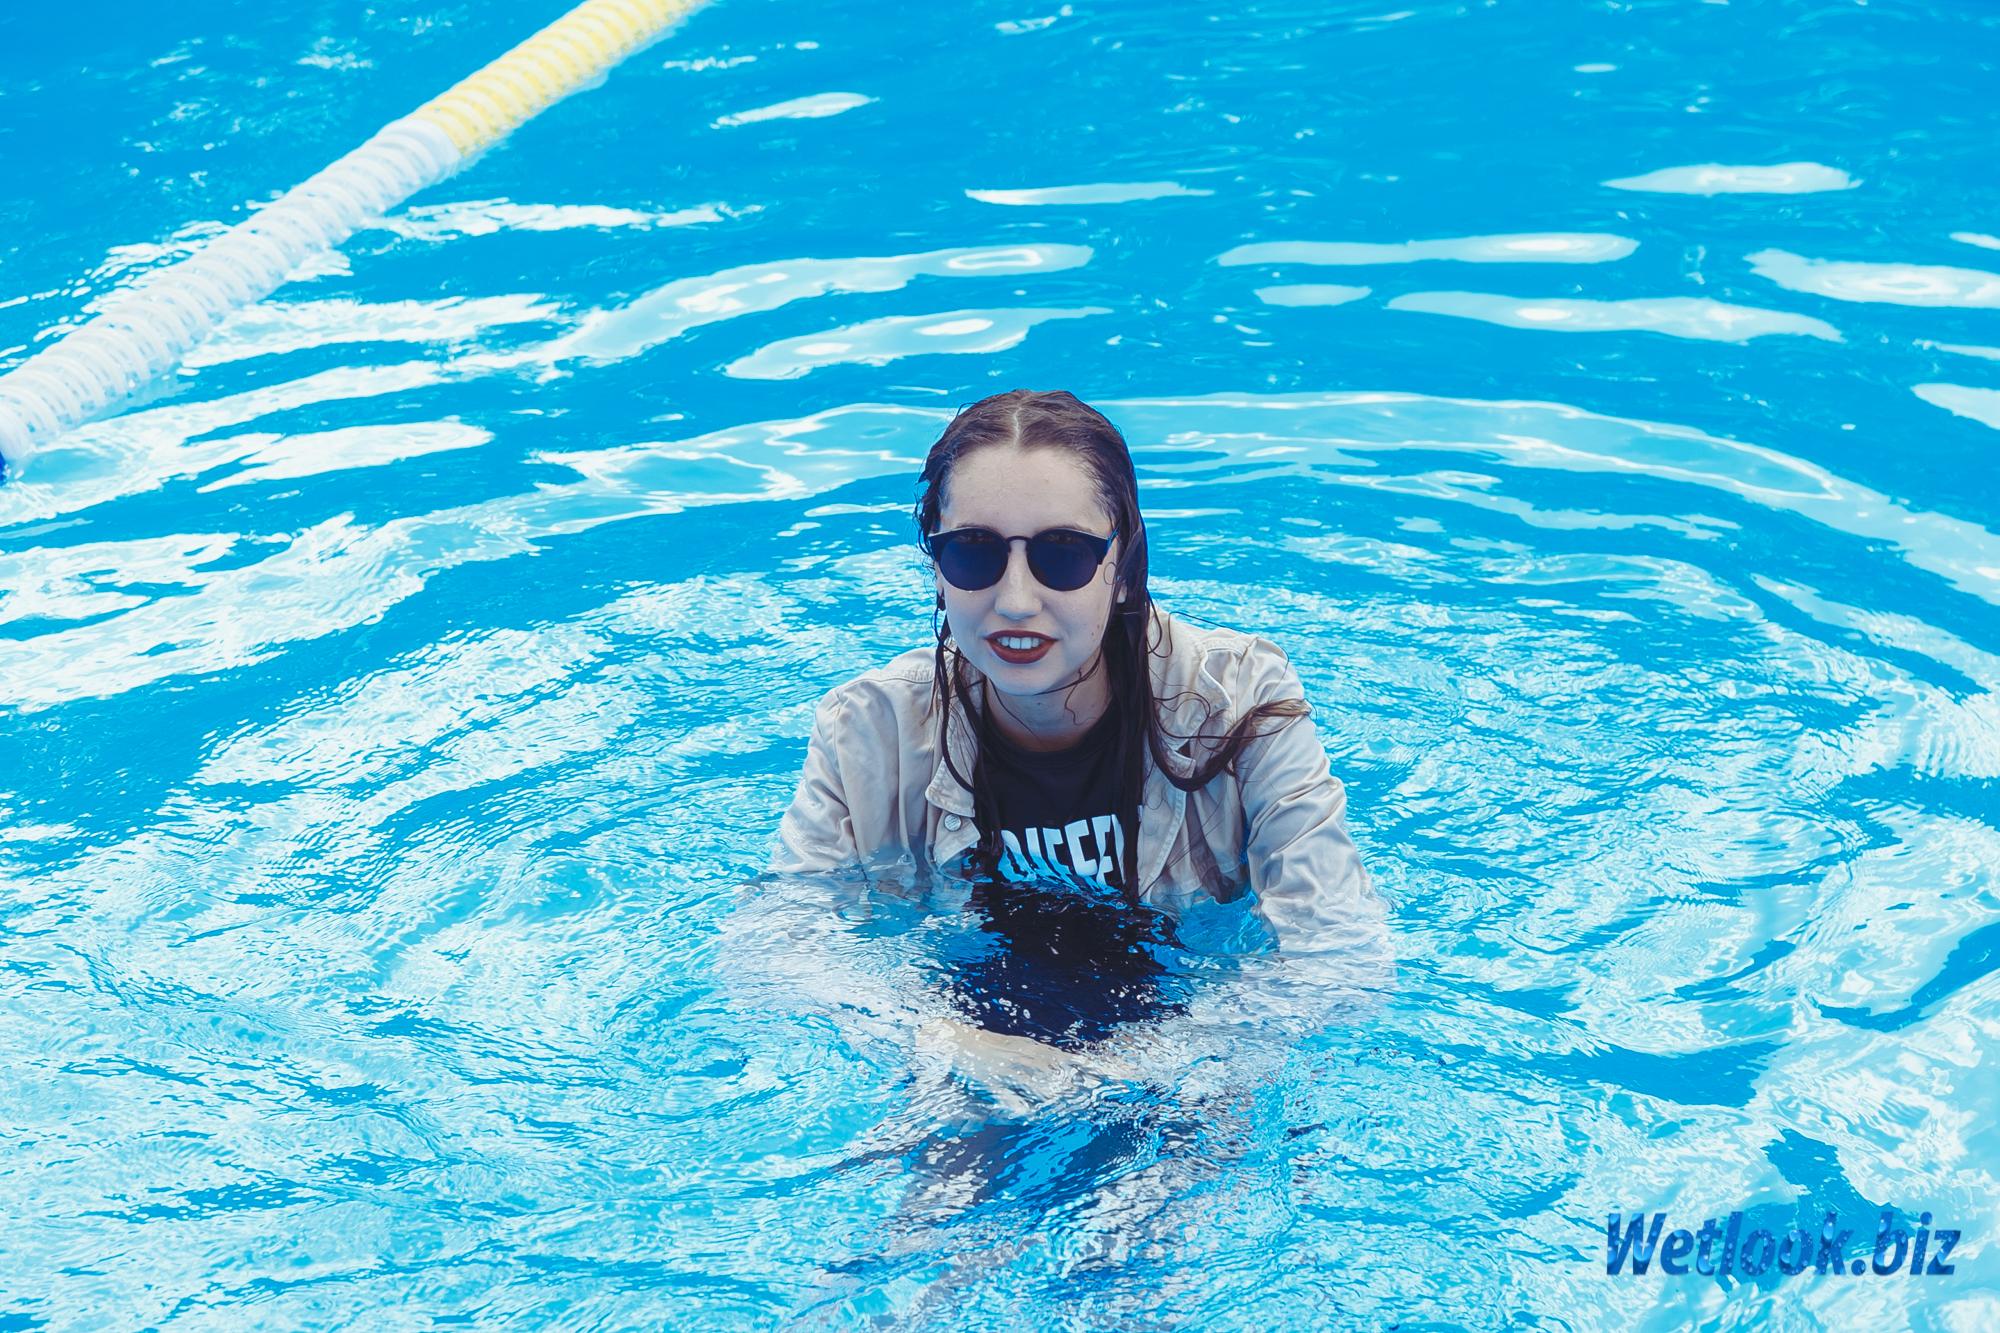 Wetlook by Emmy - Set 1 - WetLook Photo And Video